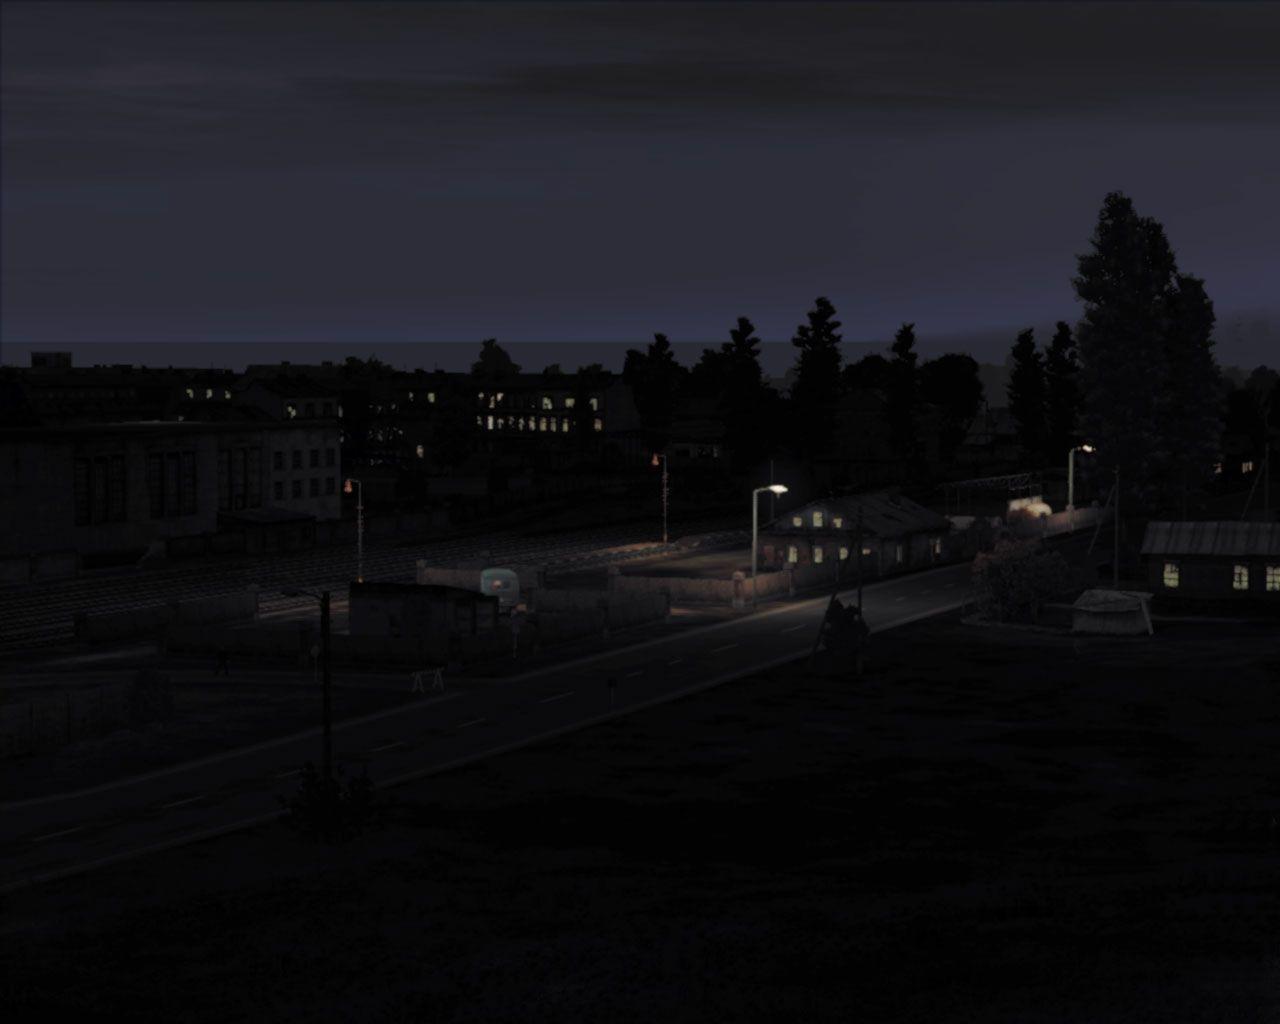 Dayz With Street Lights